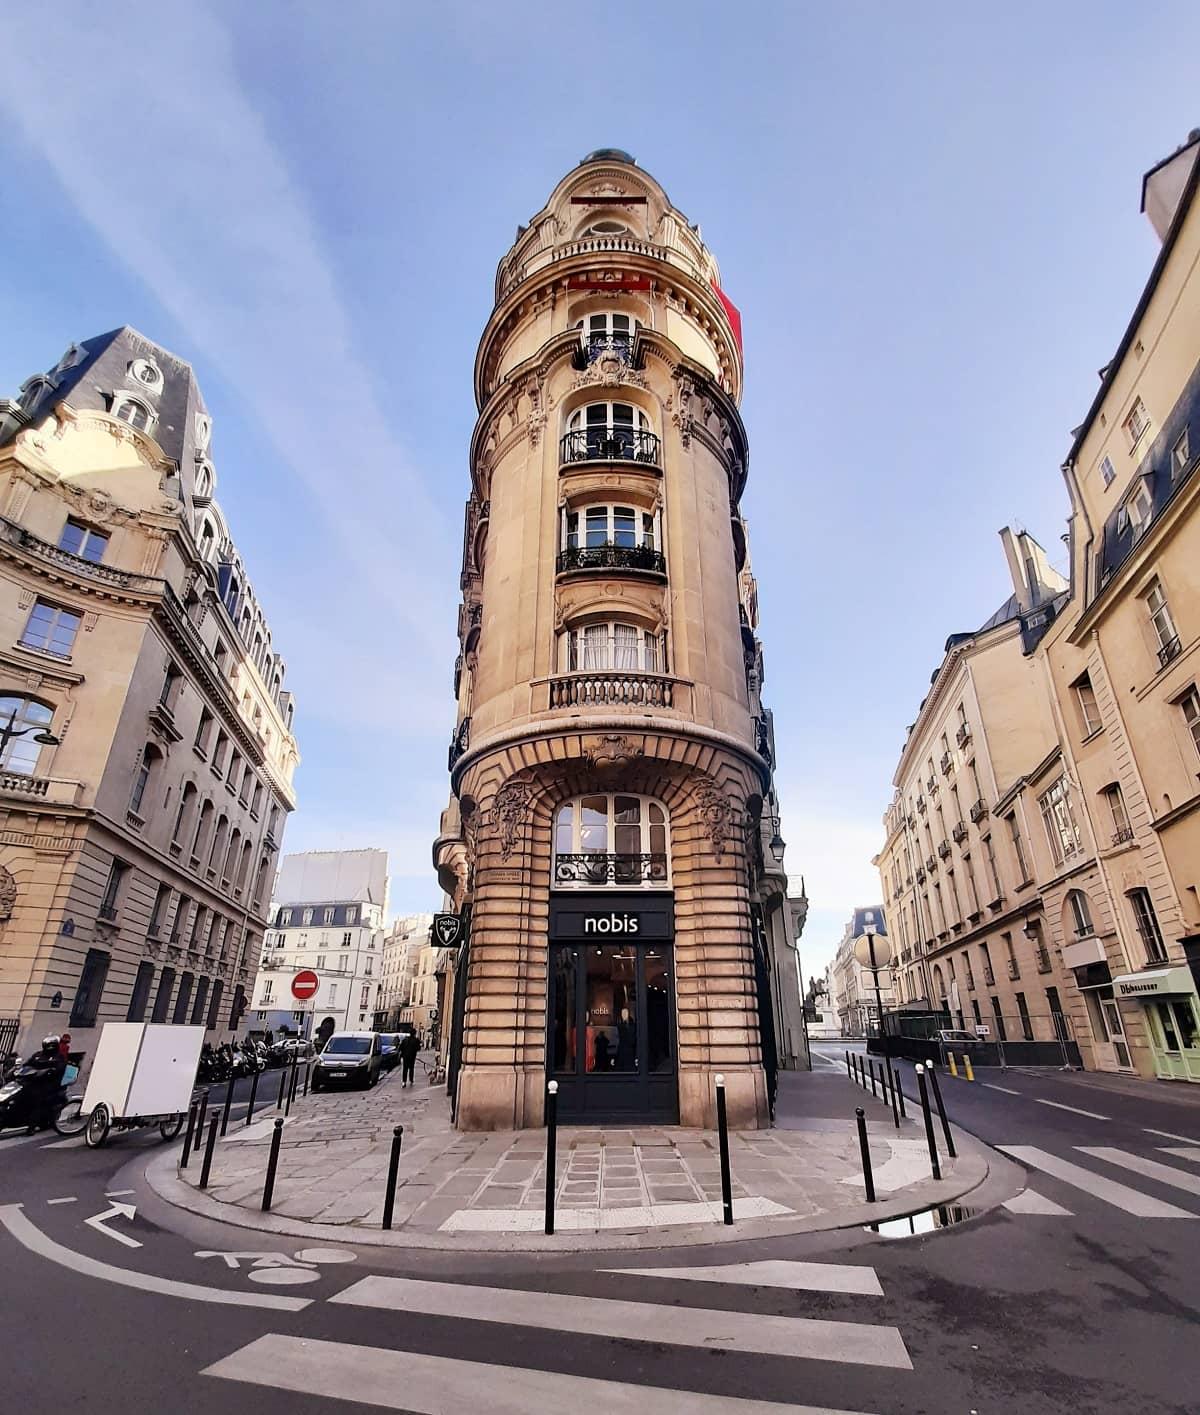 Nobis boutique paris